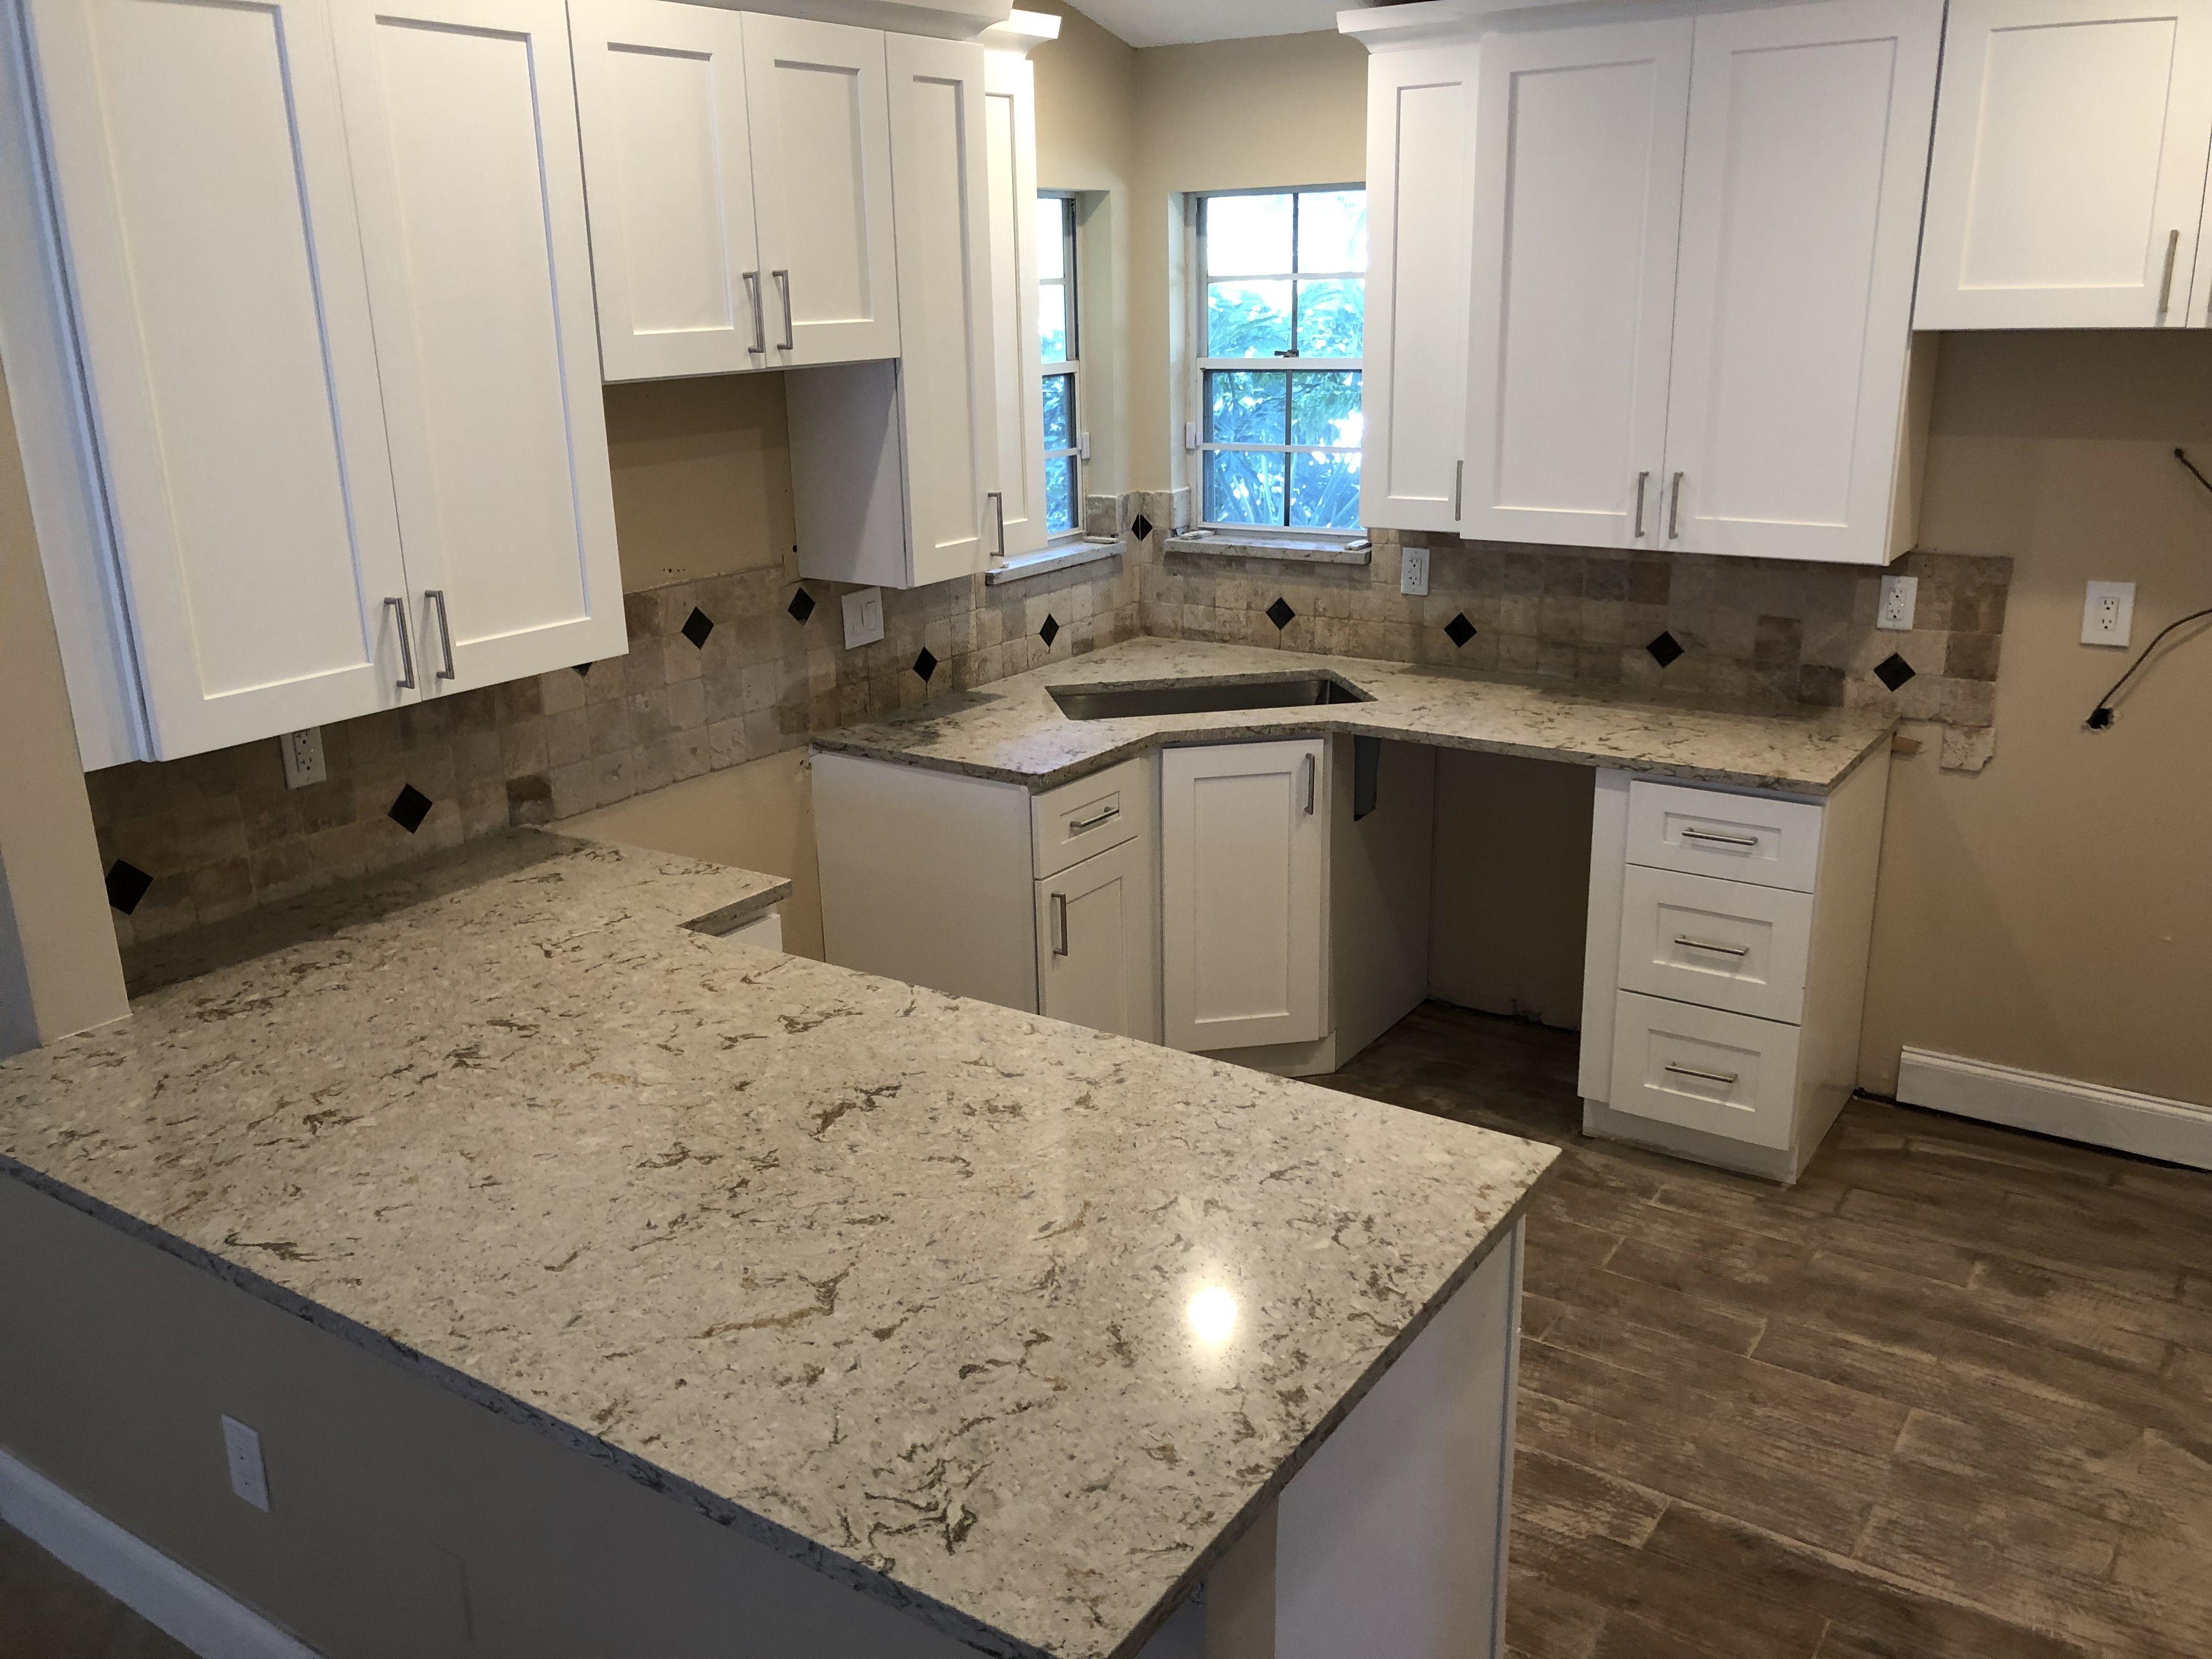 Cambria Windermere Quartz Kitchen Countertops Boca Raton Fl Quartz Kitchen Countertops Quartz Countertops Countertops